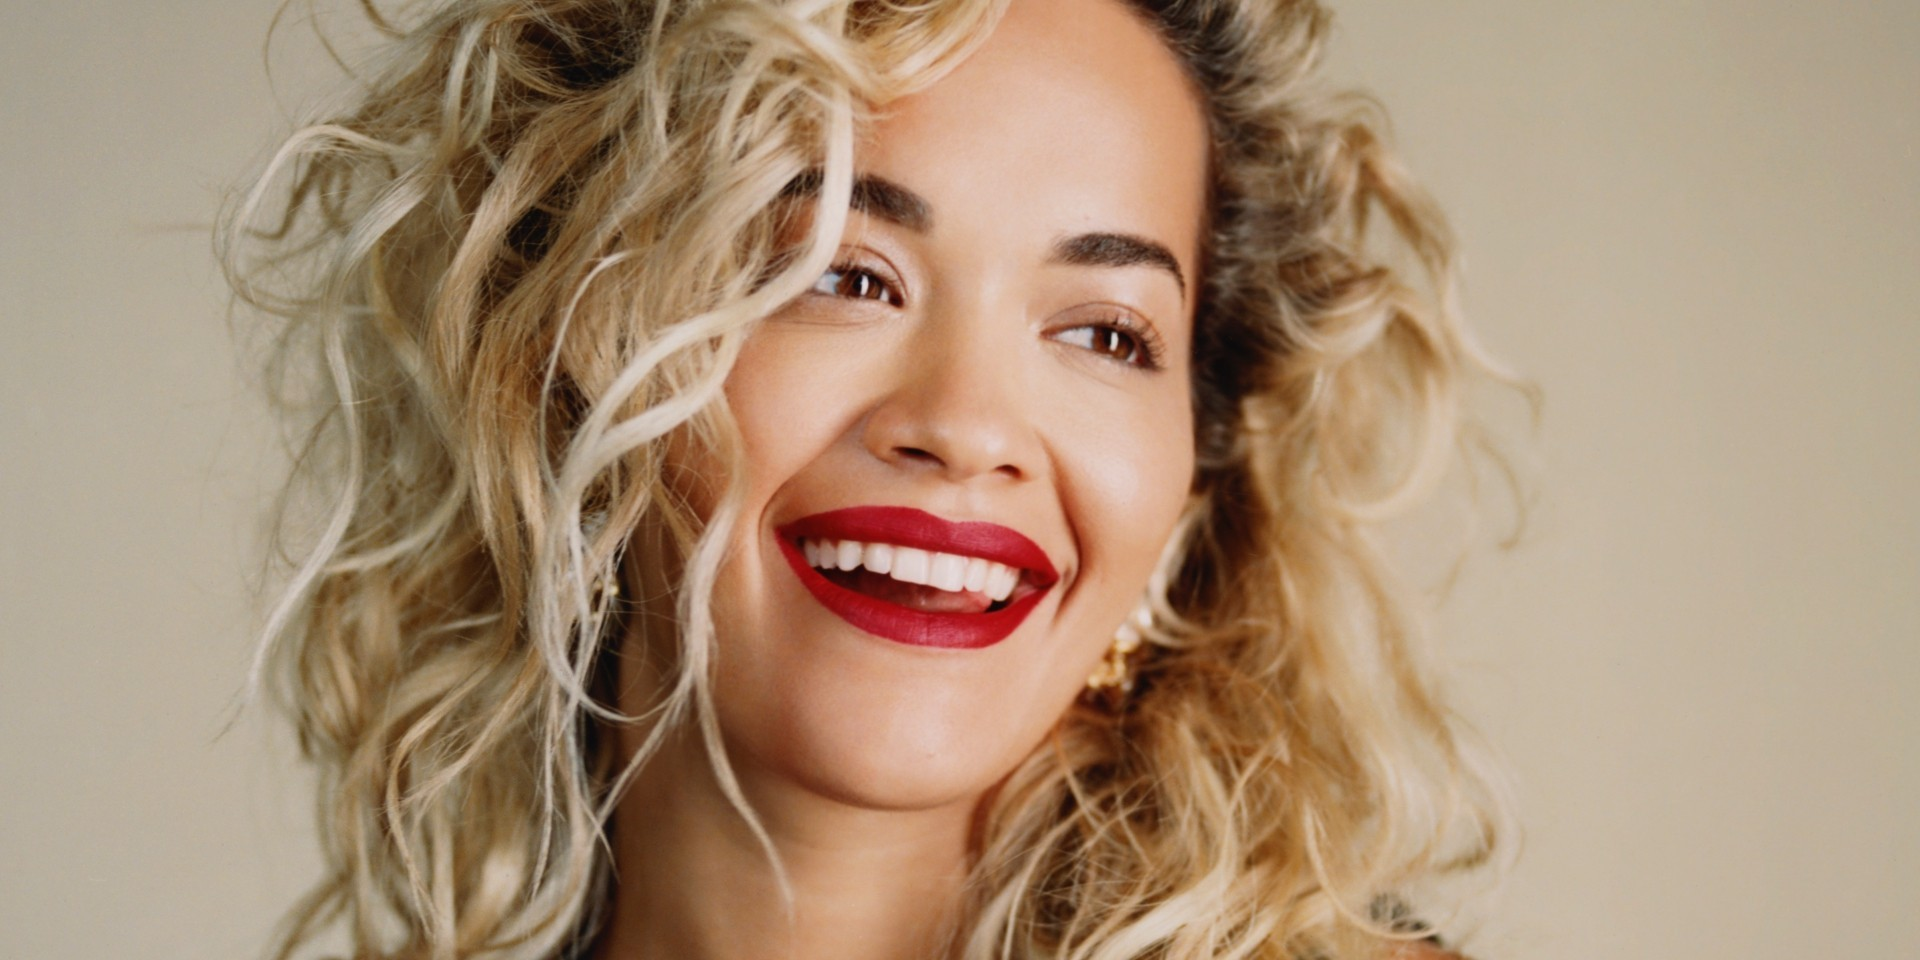 Rita Ora's first album in six years, Phoenix, will feature Avicii, Alesso, Cardi B, Rudimental and more